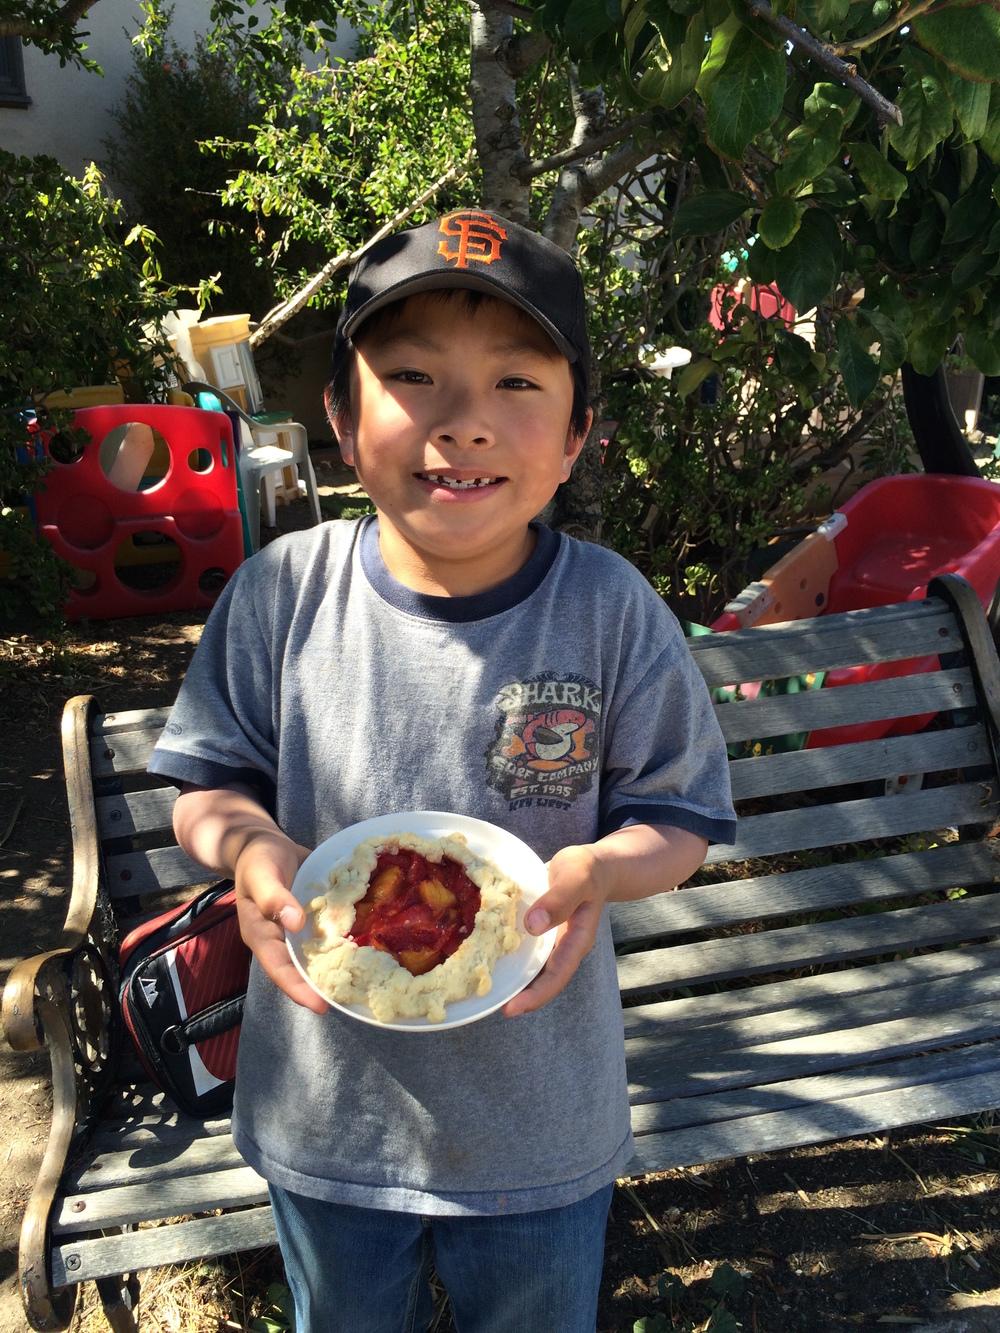 S4D2 2015 grant pie.jpg